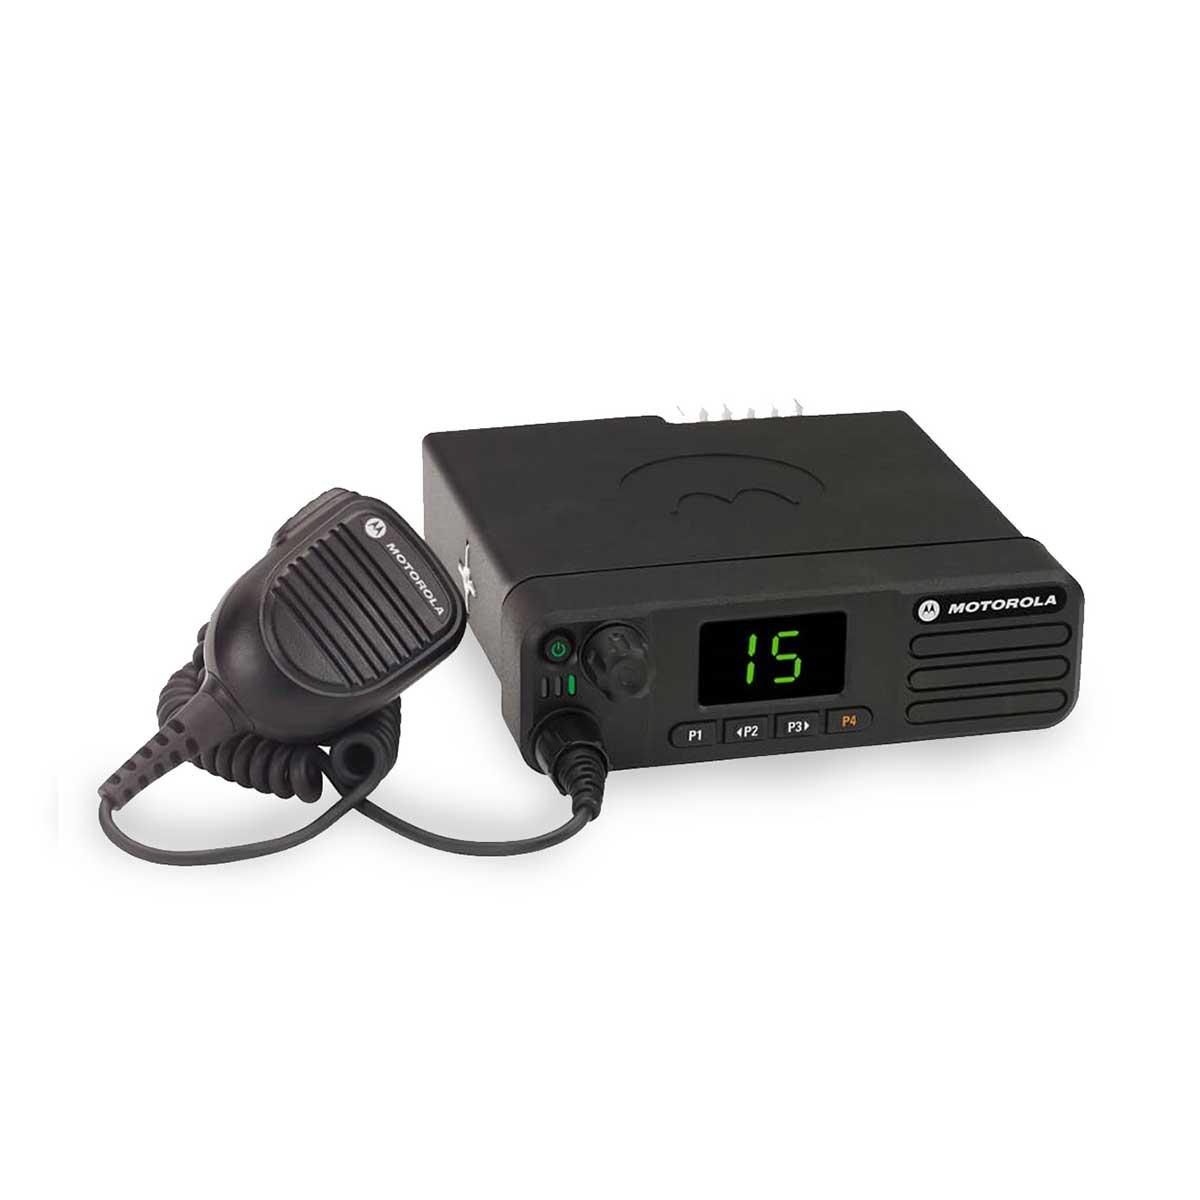 Radio Motorola DGM5000e Digital LAM28JNC9SA1AN VHF 136-174 MHZ de 25W